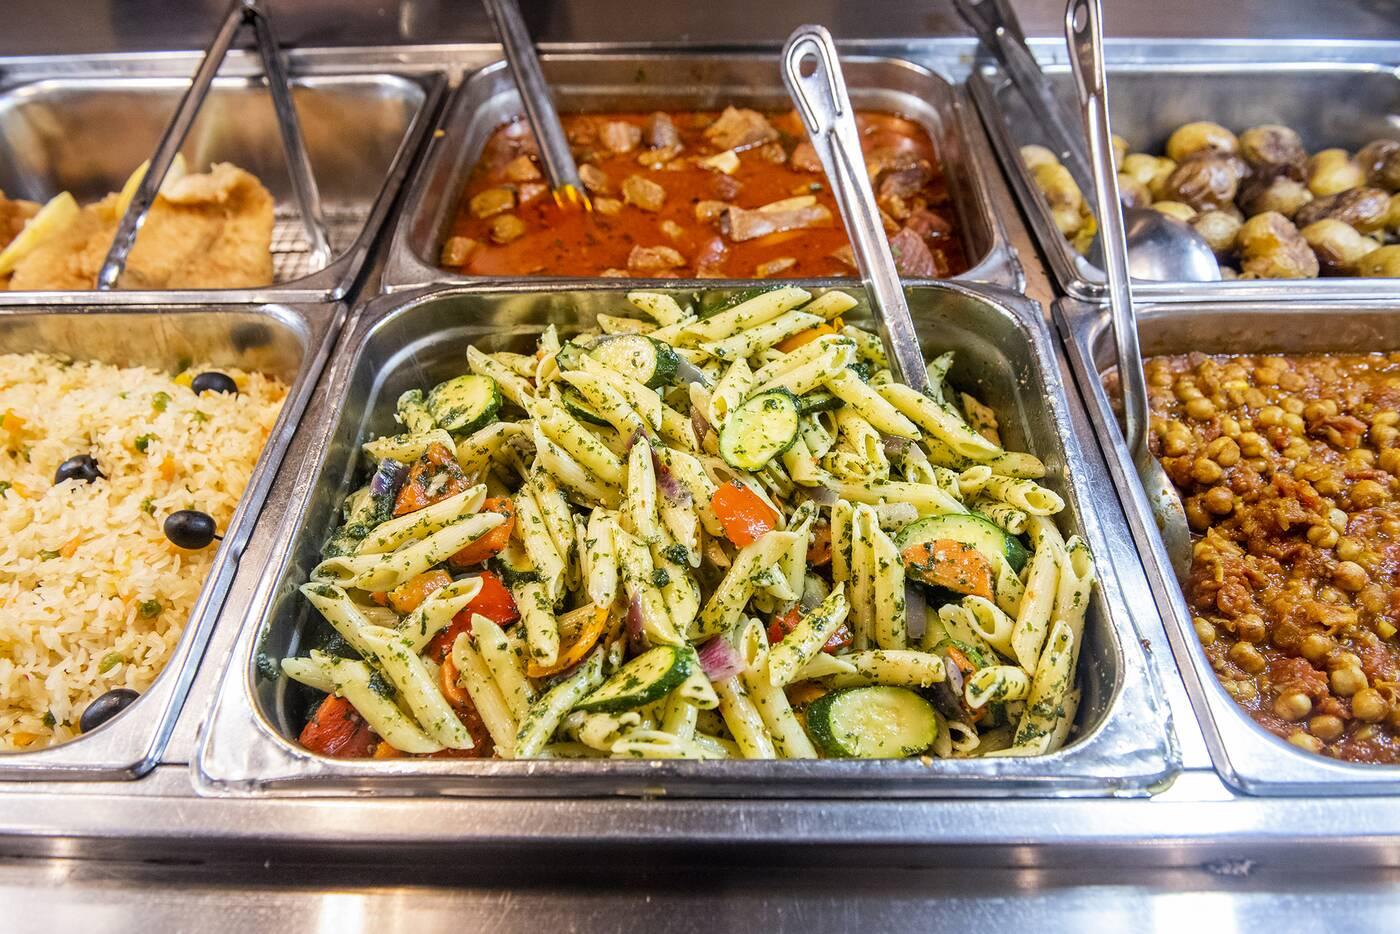 Prepared Foods Toronto